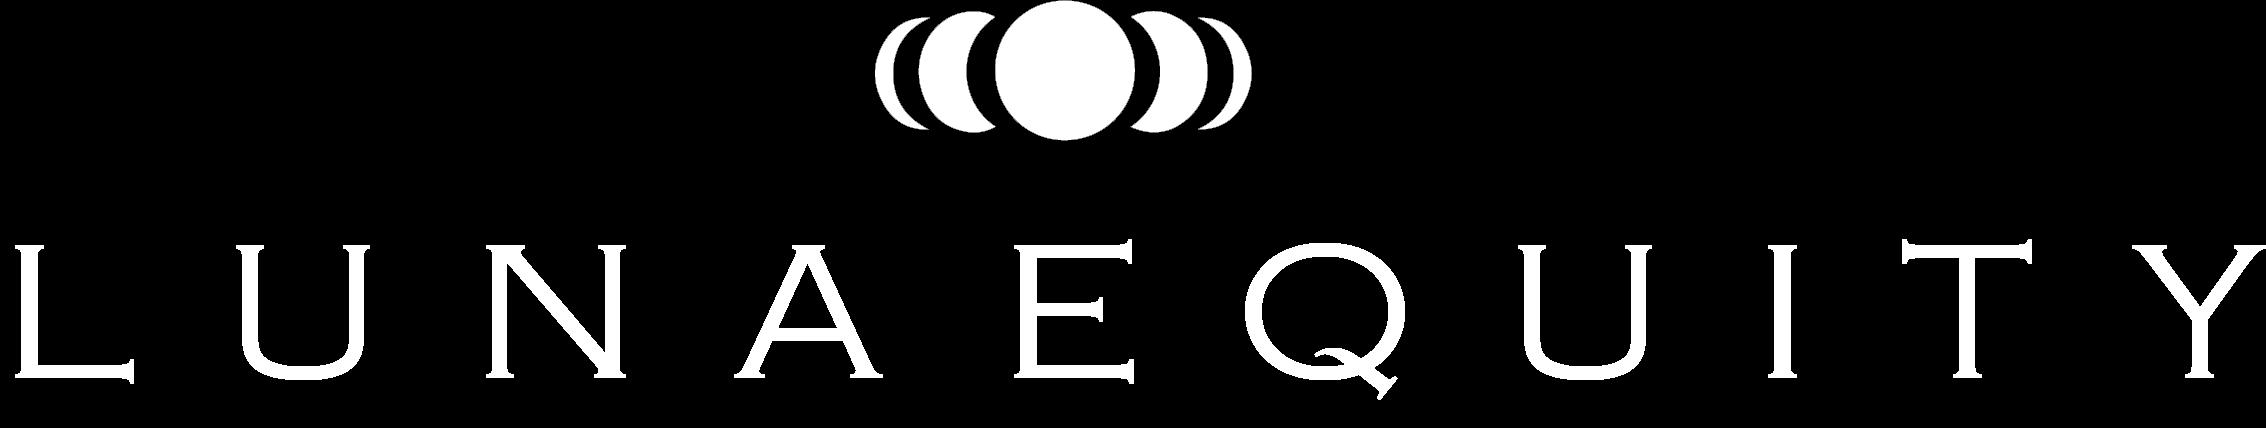 invert logo .png